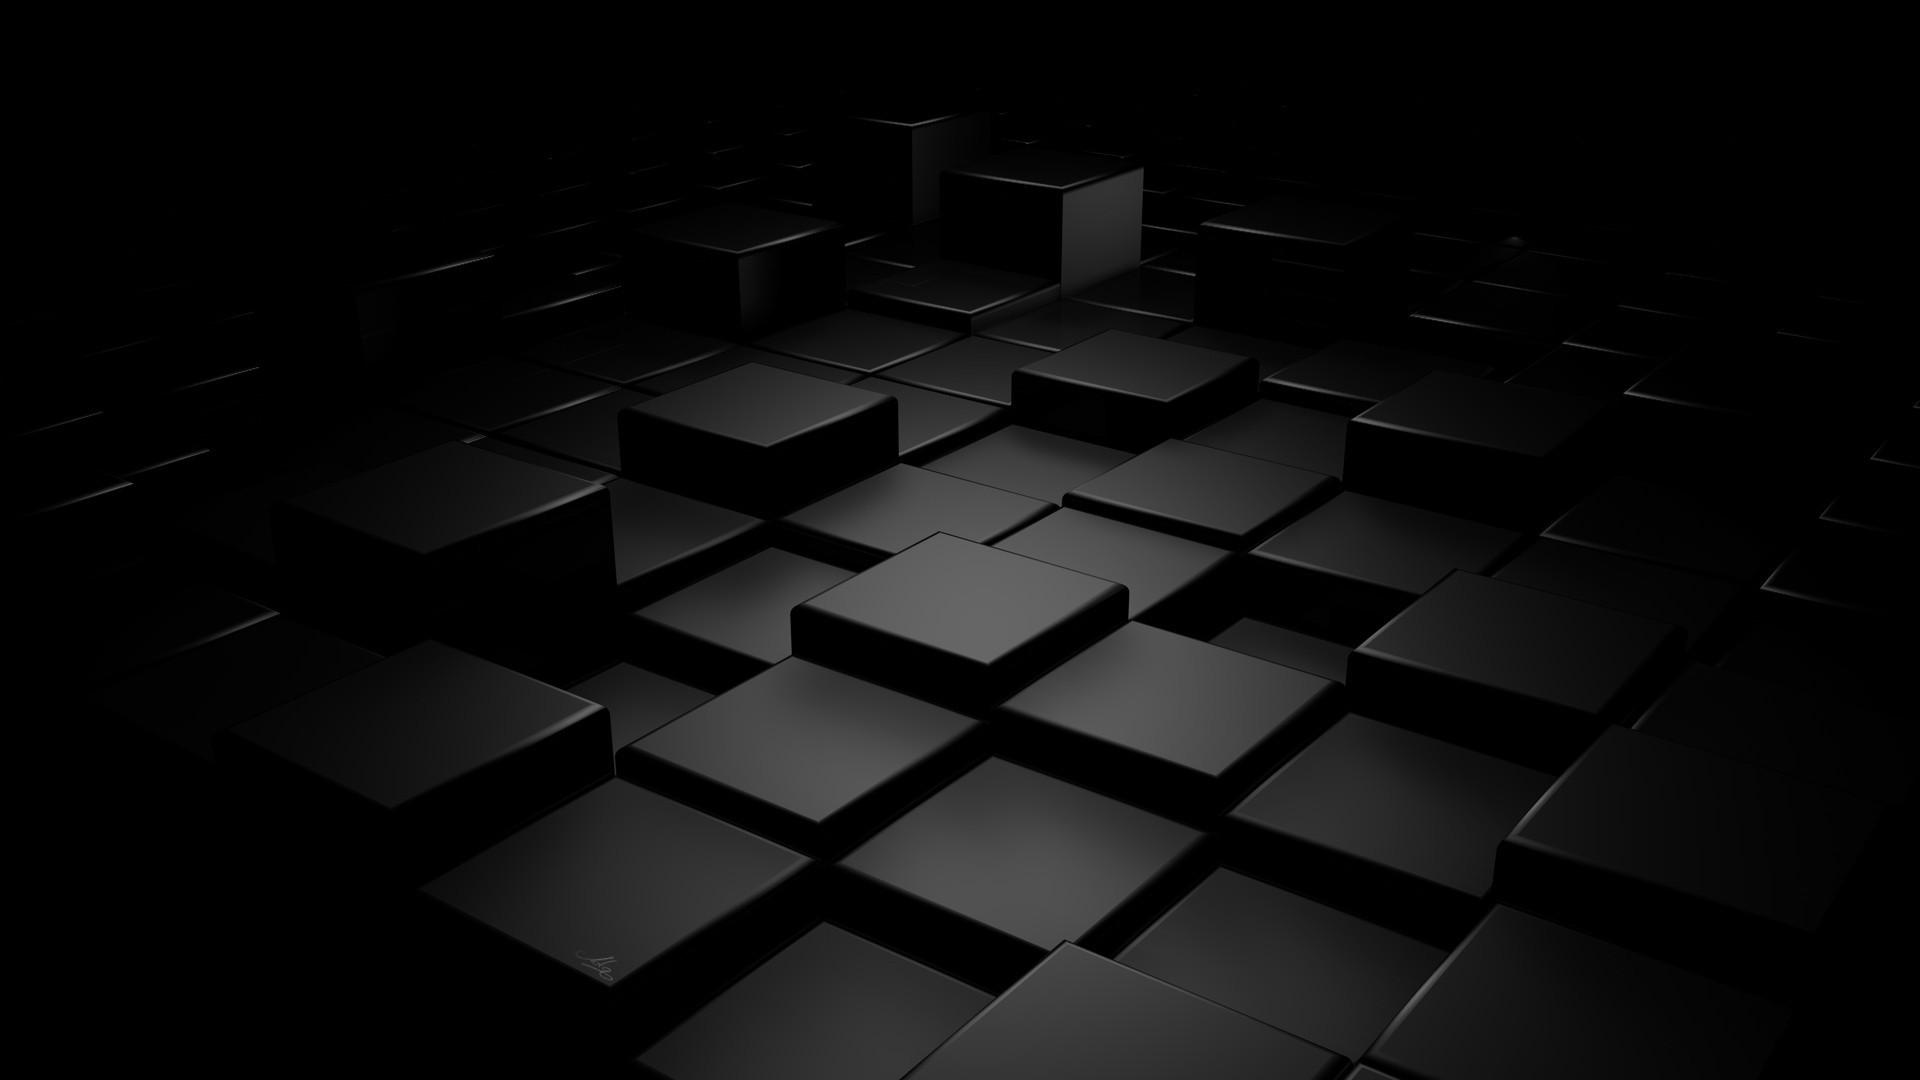 Black Abstract desktop wallpaper